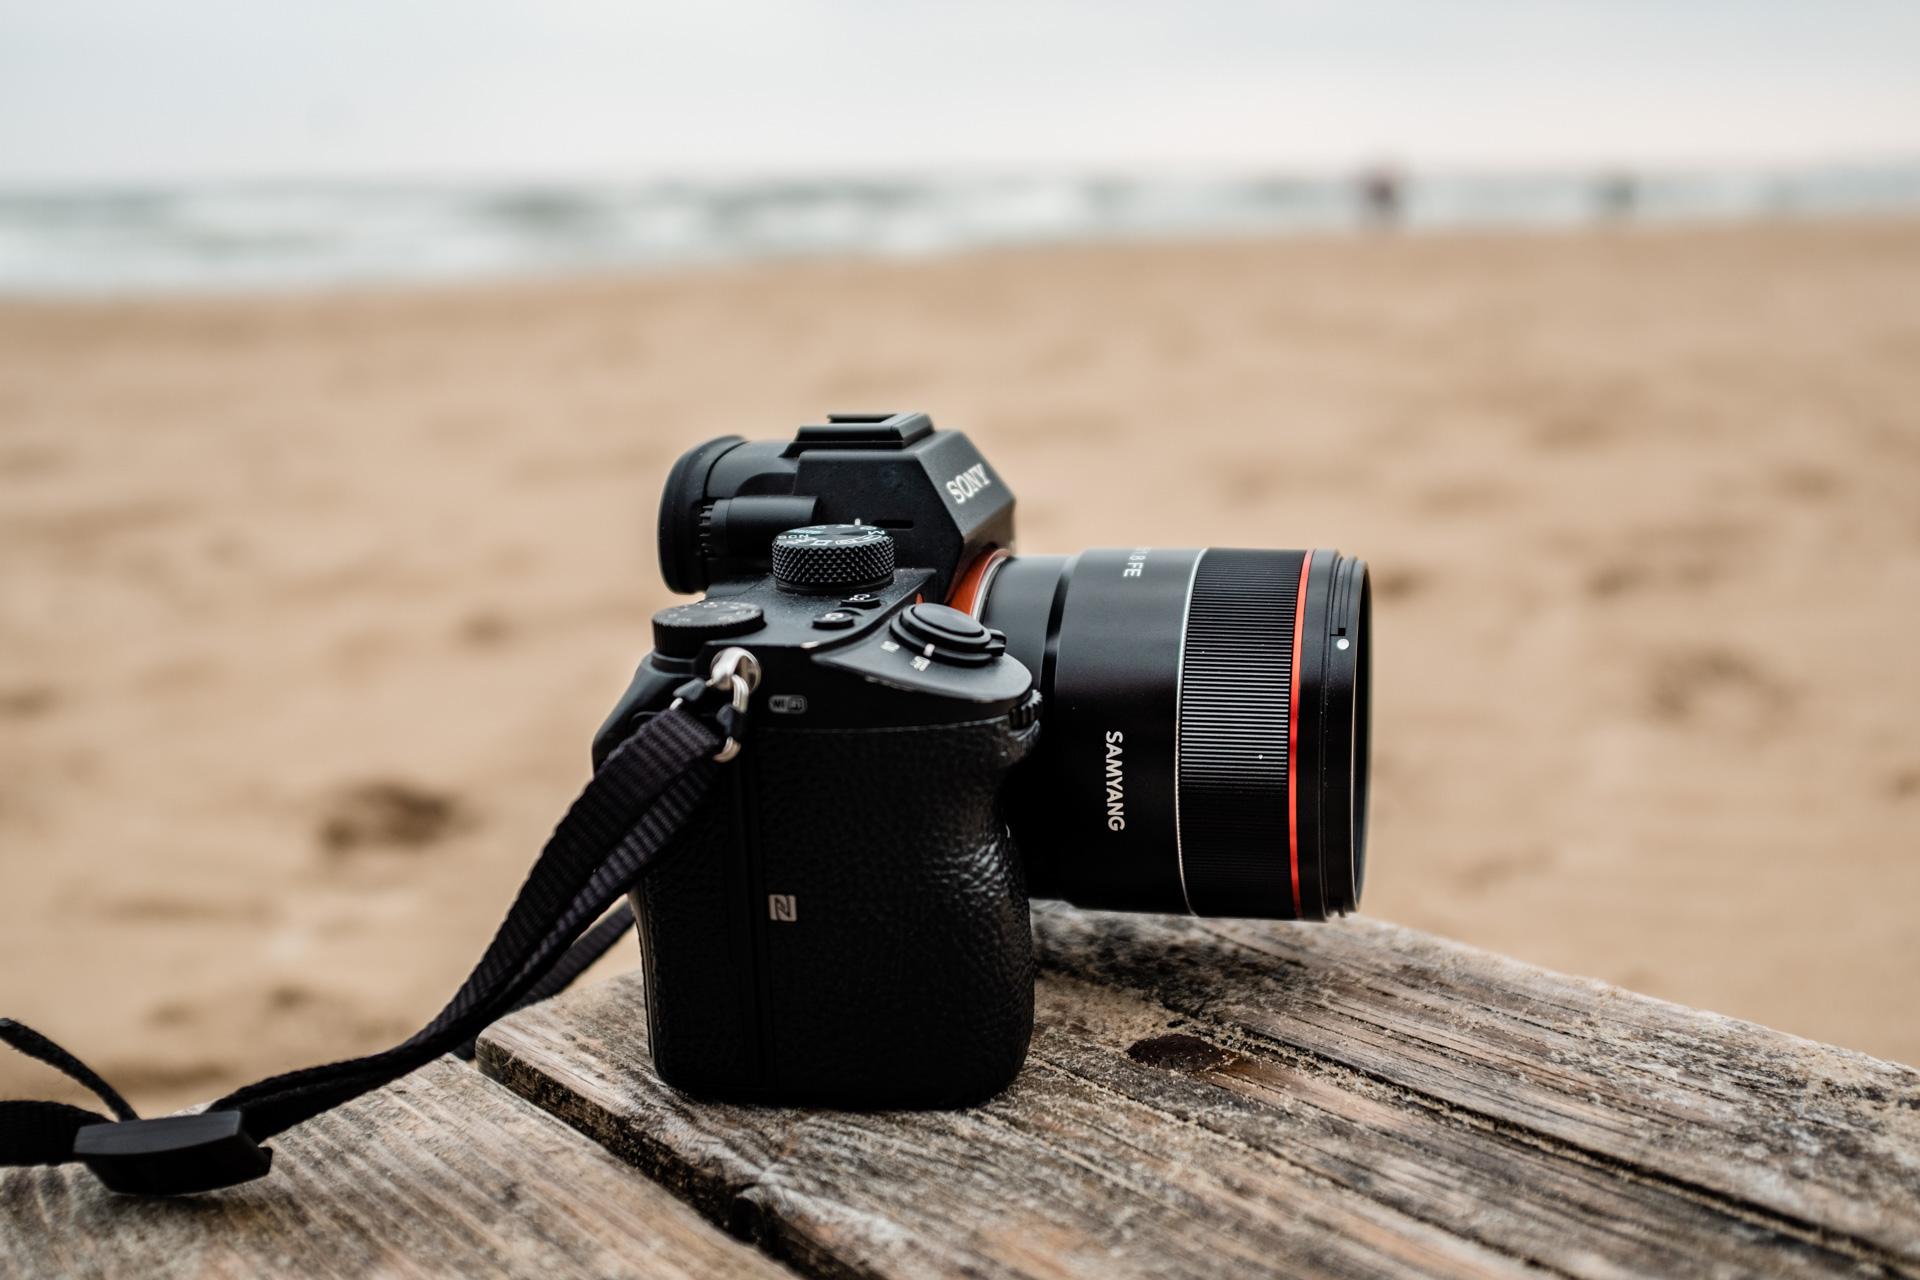 Samyang 35 mm f/1.8 FE